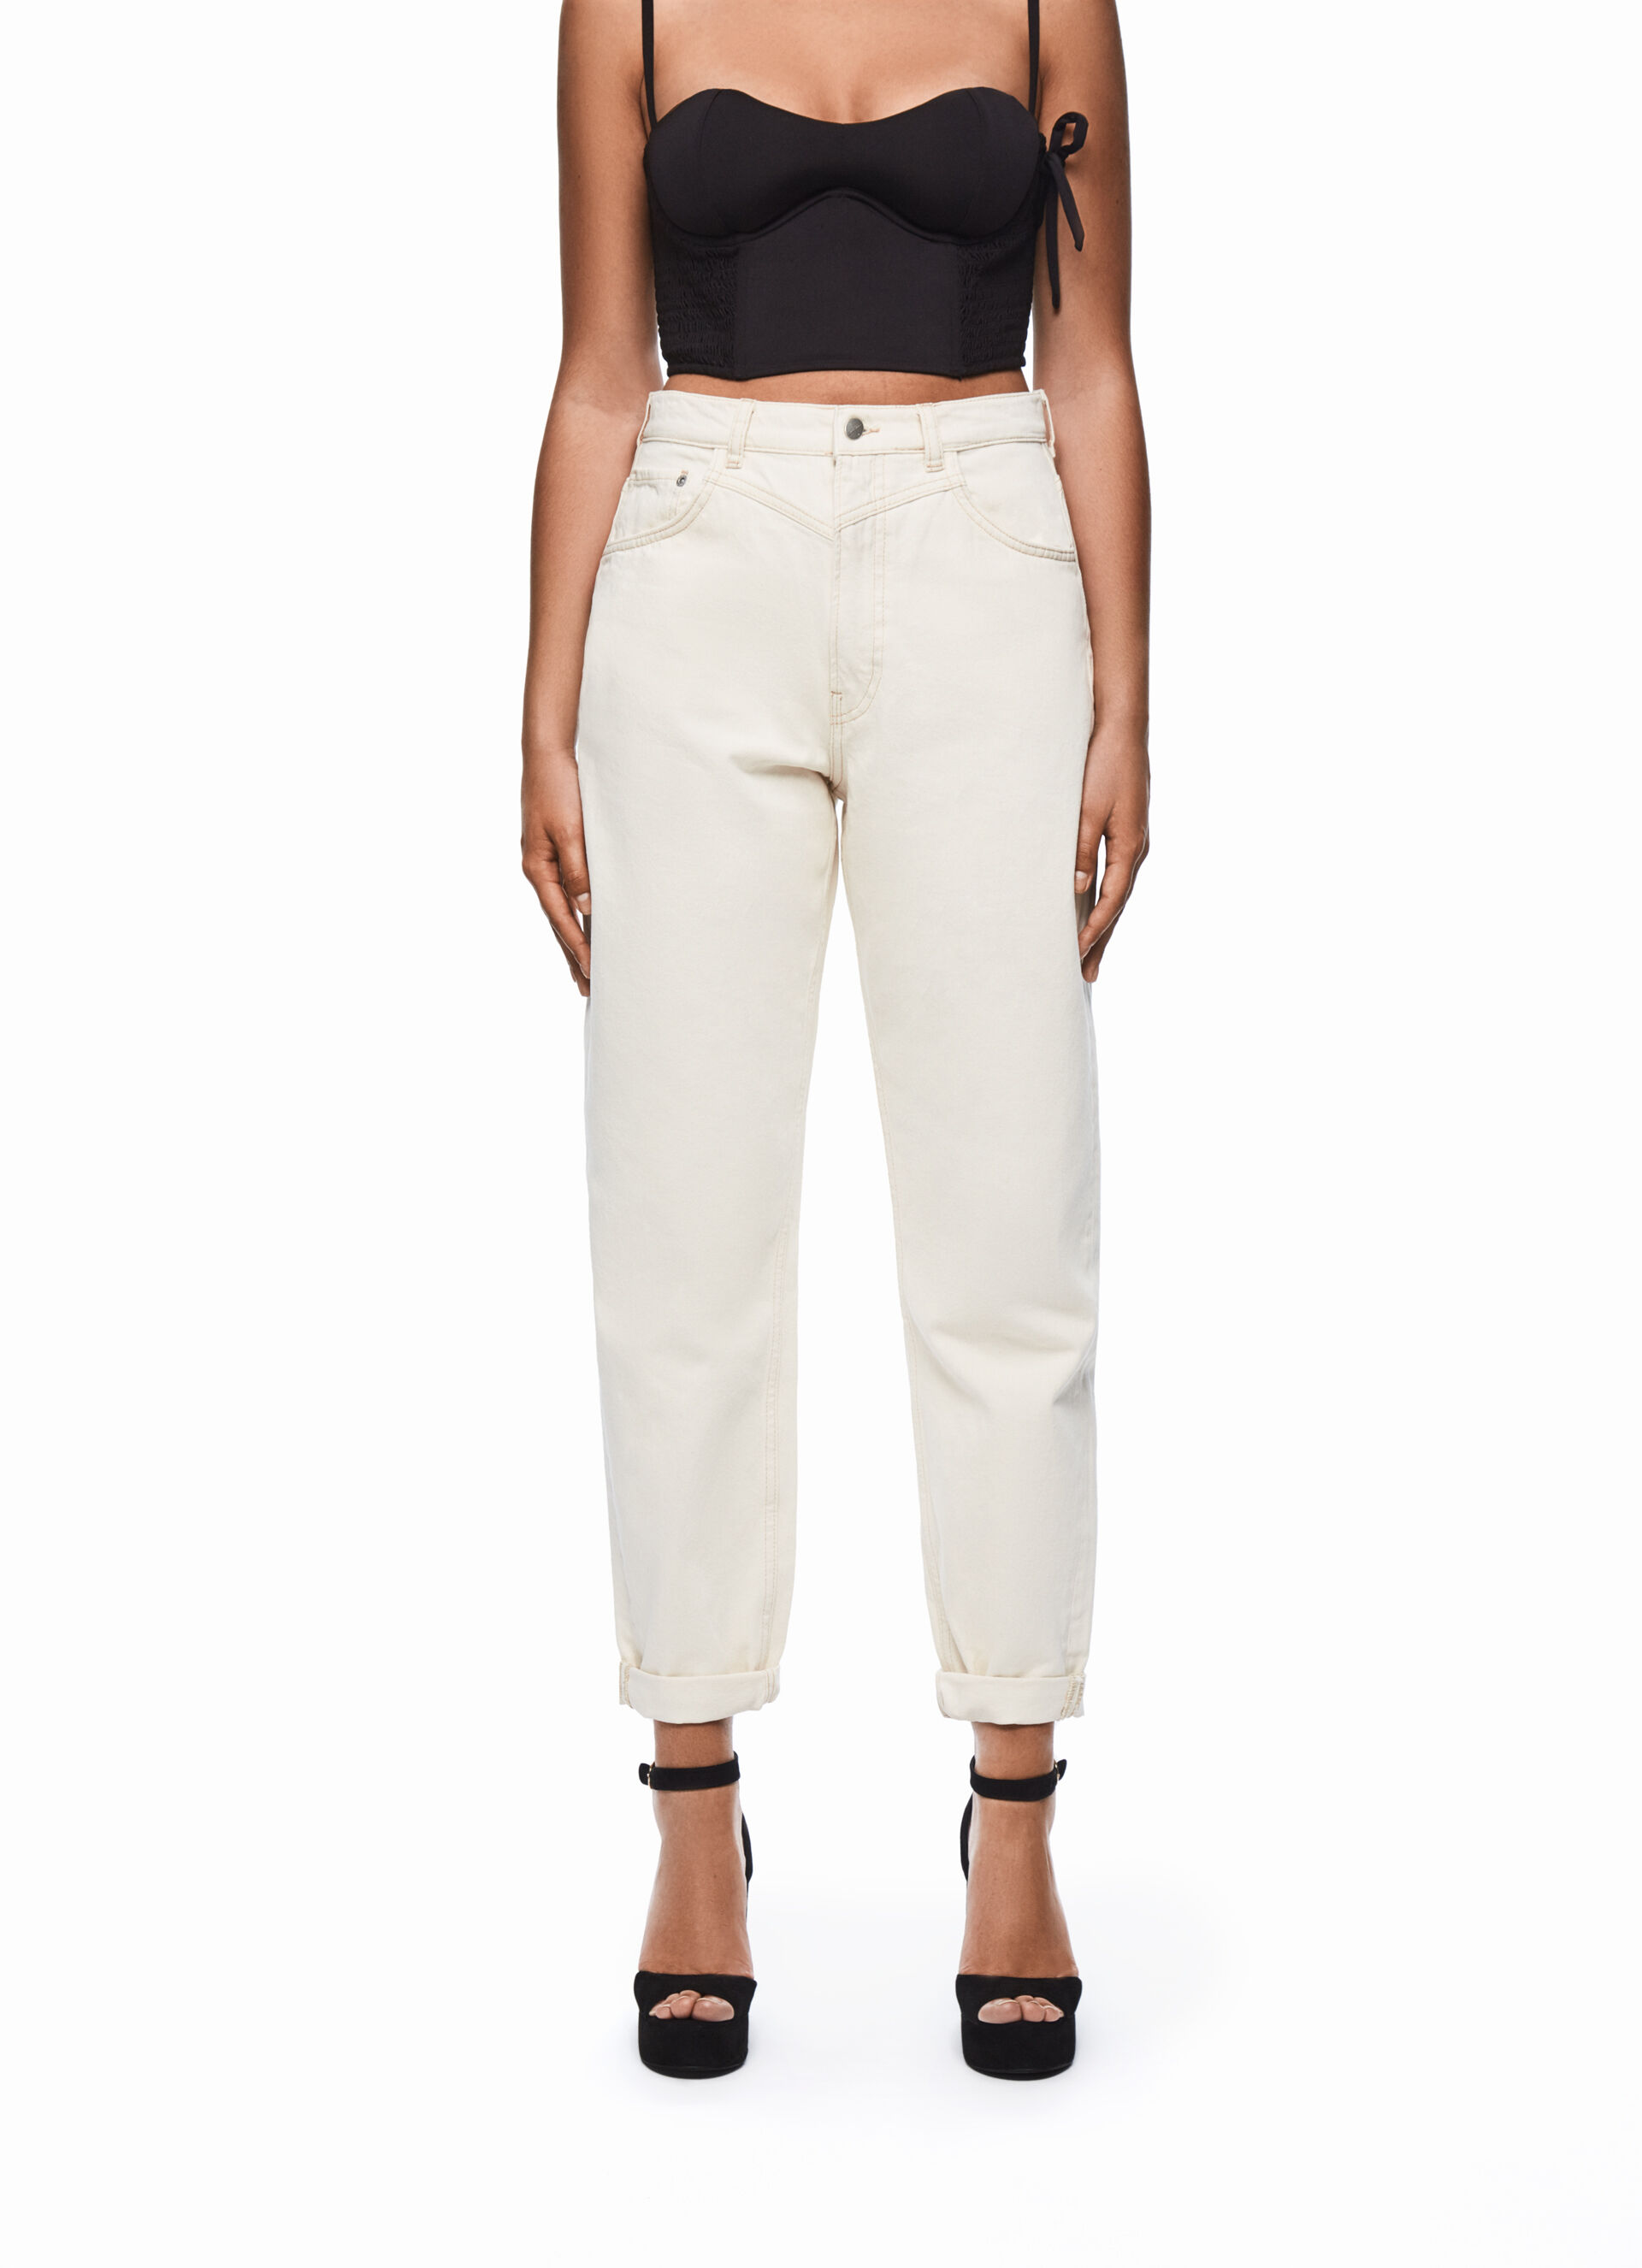 DUA LIPA X PEPE JEANS White High Rise Denim Jeans